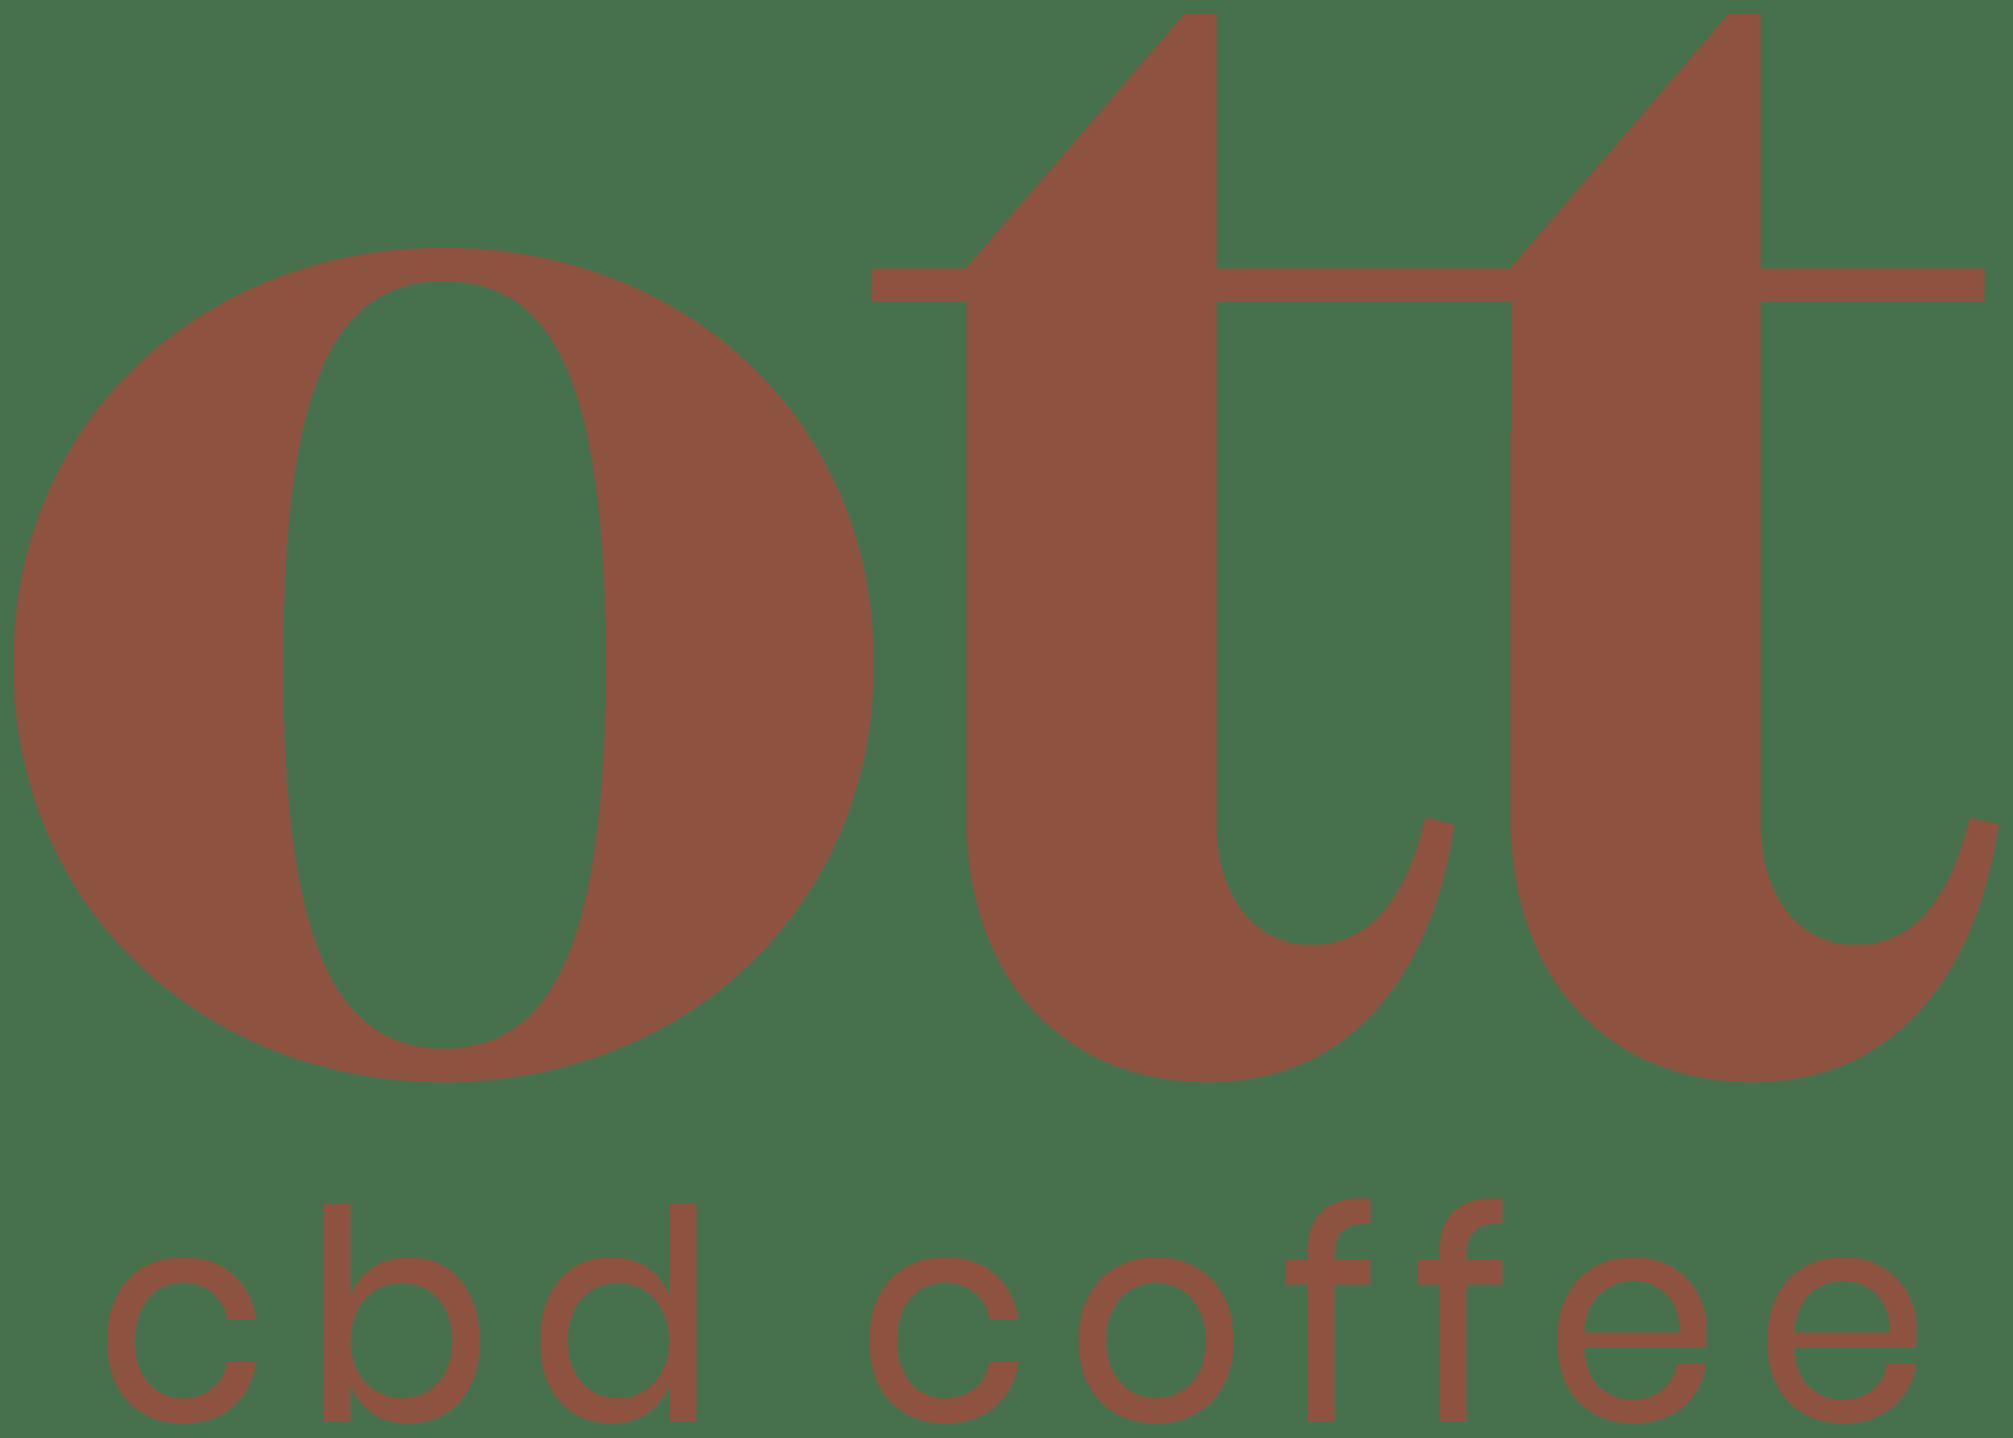 ottcoffee